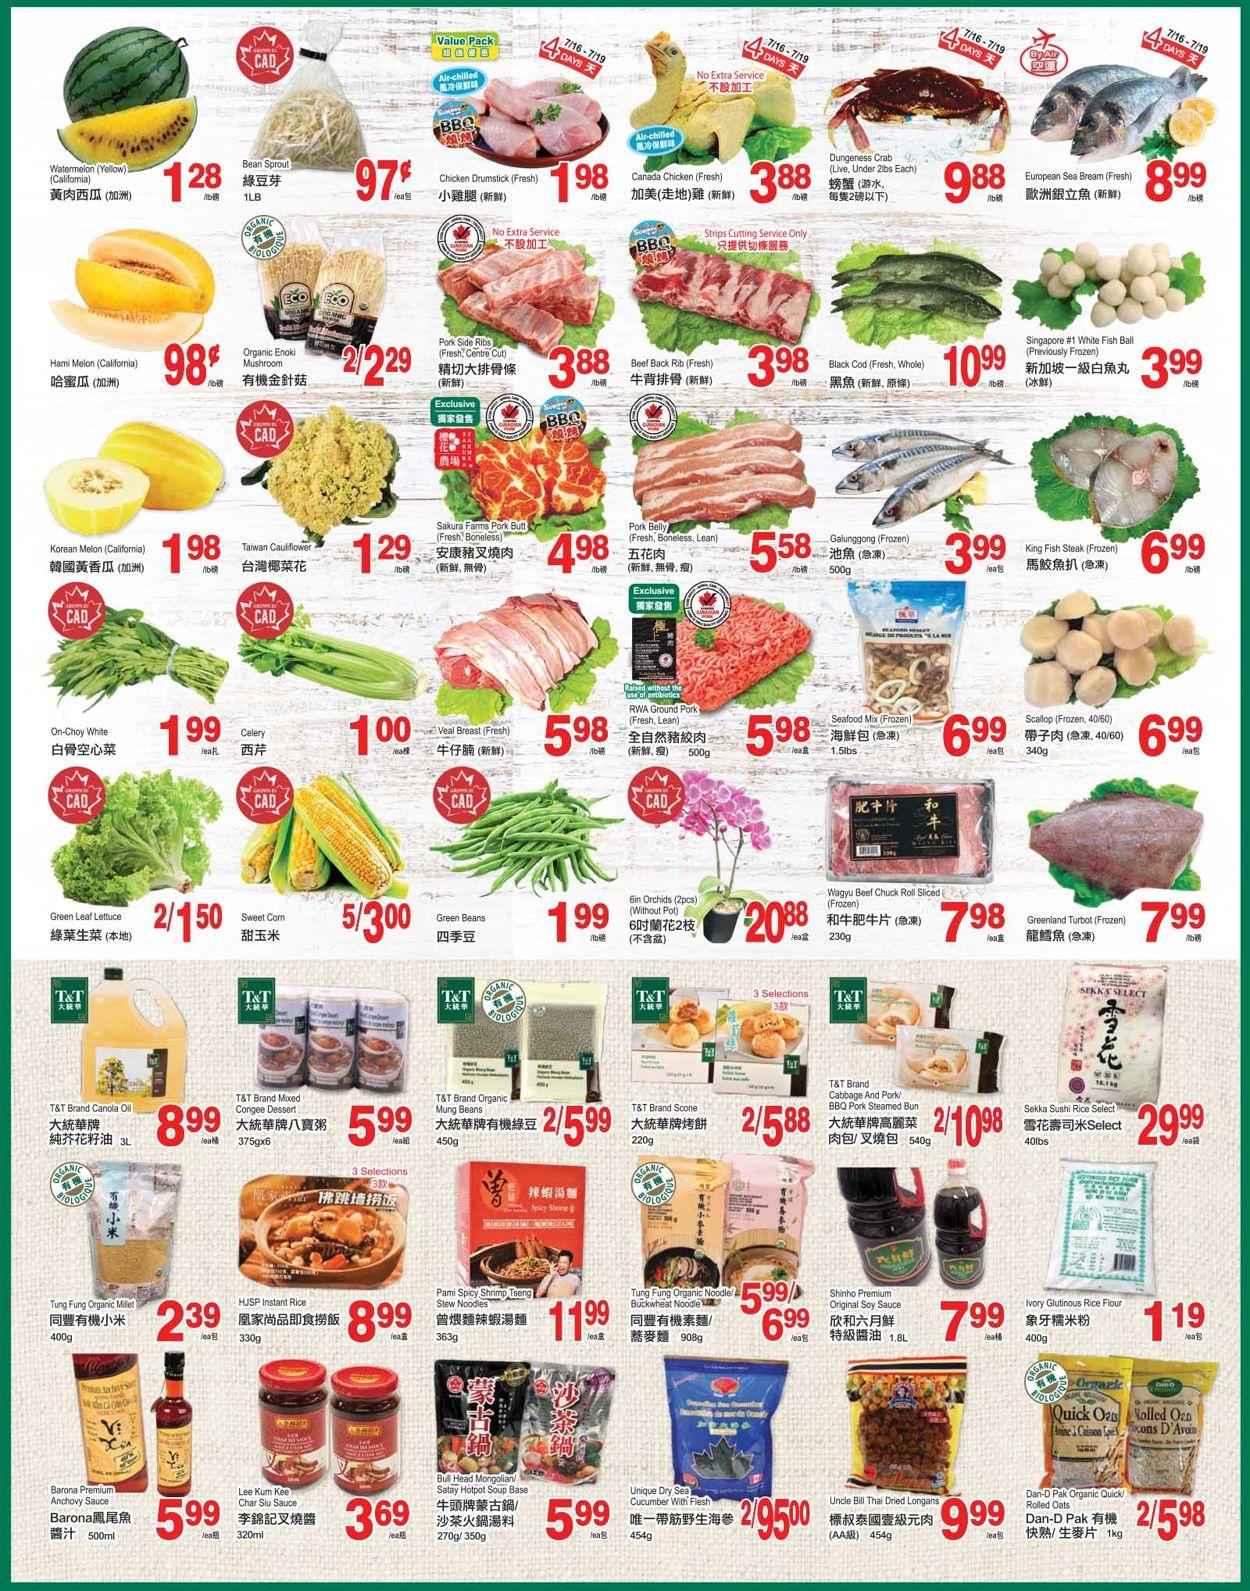 T&T Supermarket - Alberta Flyer - 07/16-07/22/2021 (Page 2)